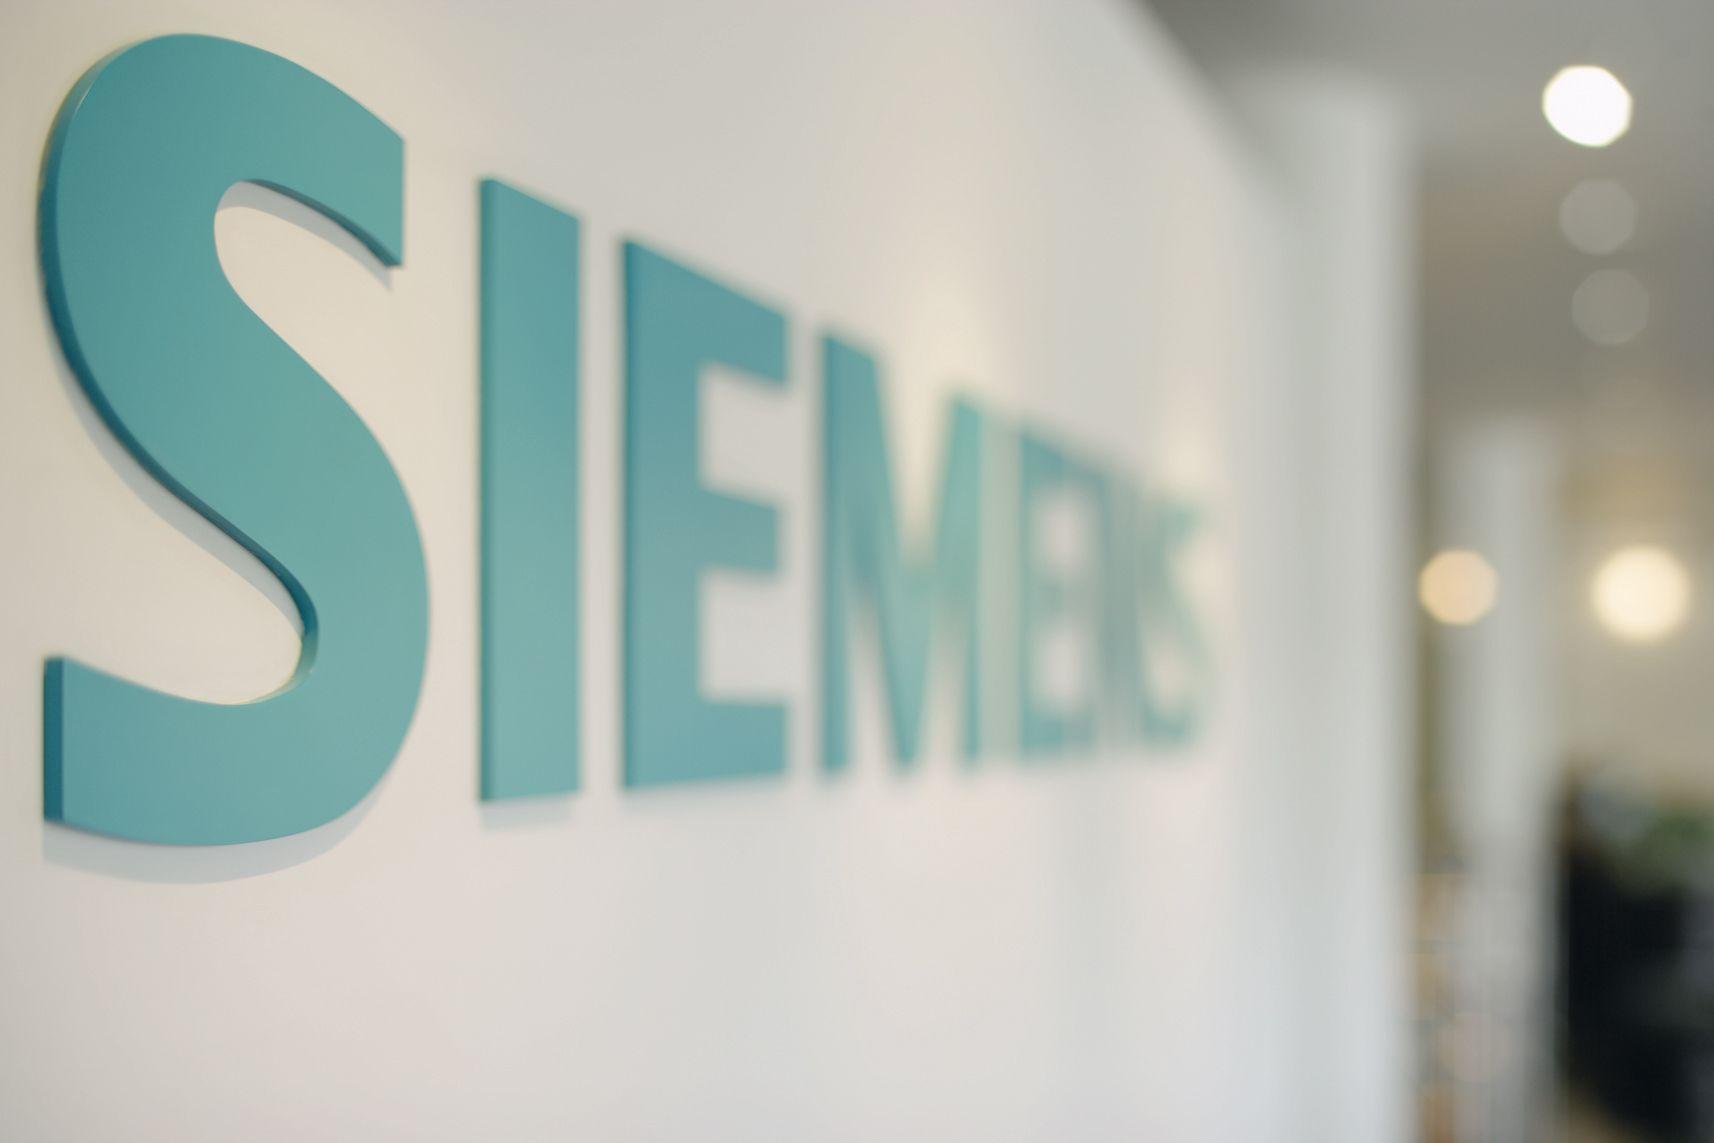 Siemens: Αναβλήθηκε επ' αόριστον η δίκη της γιατί… δεν μετέφρασαν τα κατηγορητήρια!